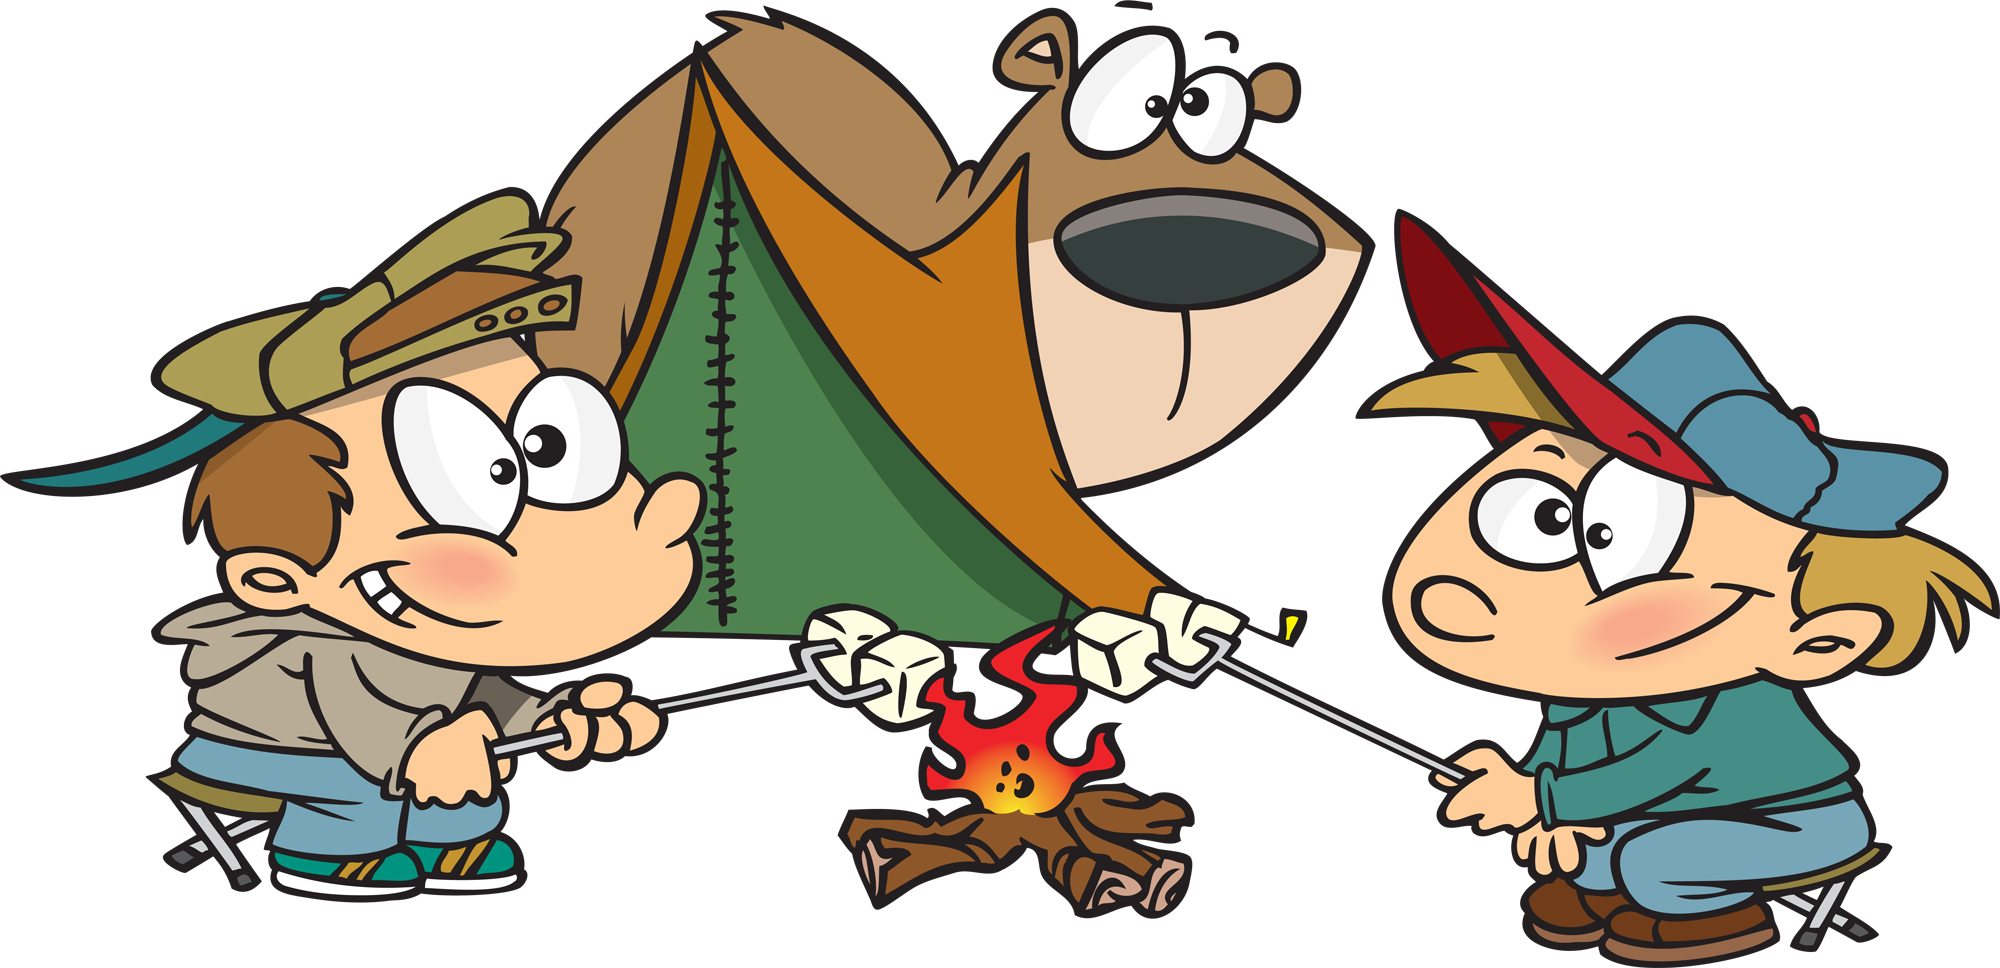 clip art royalty free library Free cartoons download clip. Cartoon clipart camping.